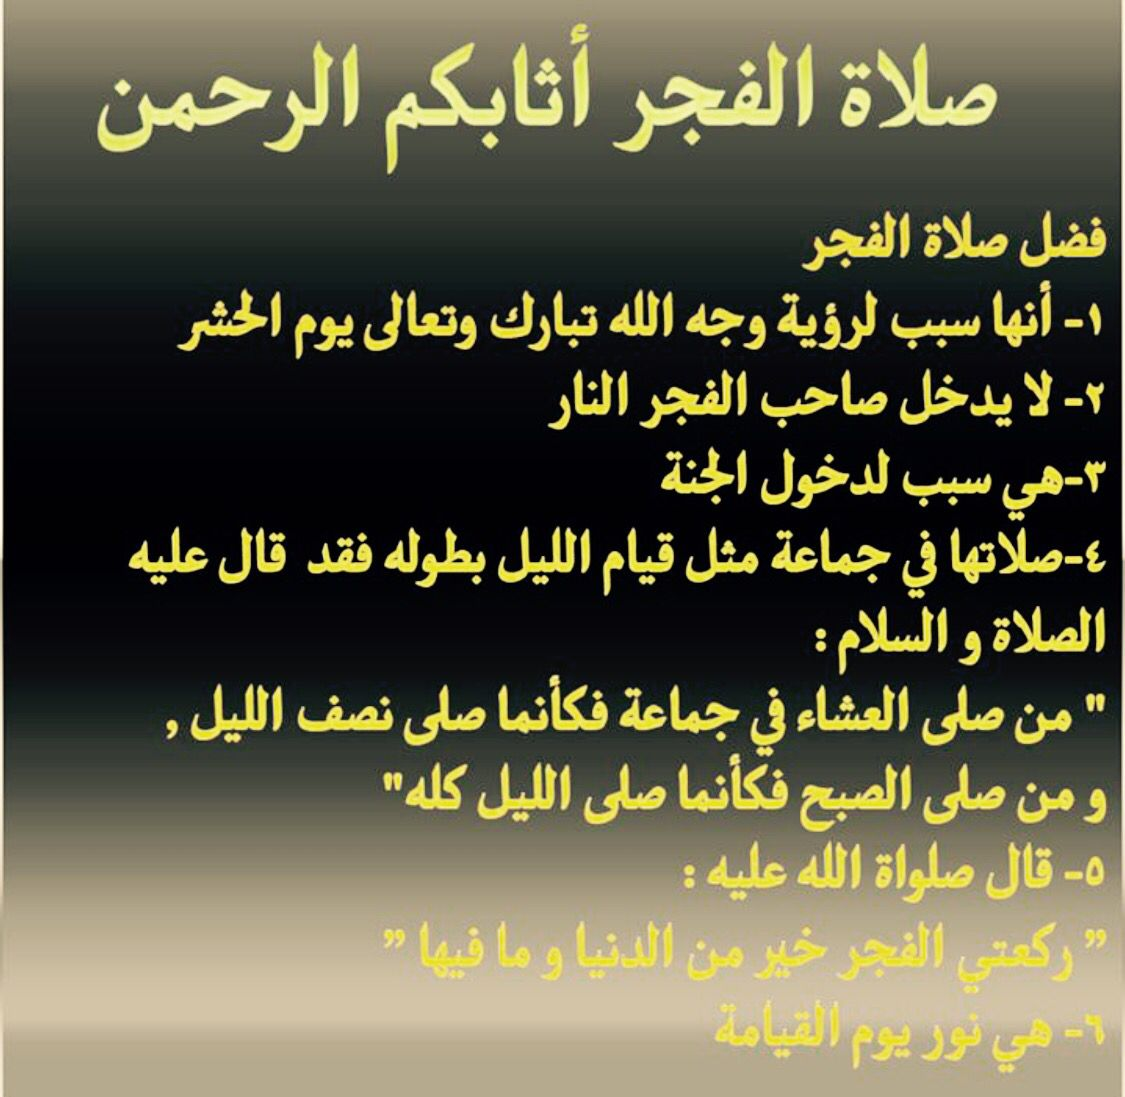 Desertrose صلاة الفجر أثابكم الرحمن Hadeeth Holy Quran Quran